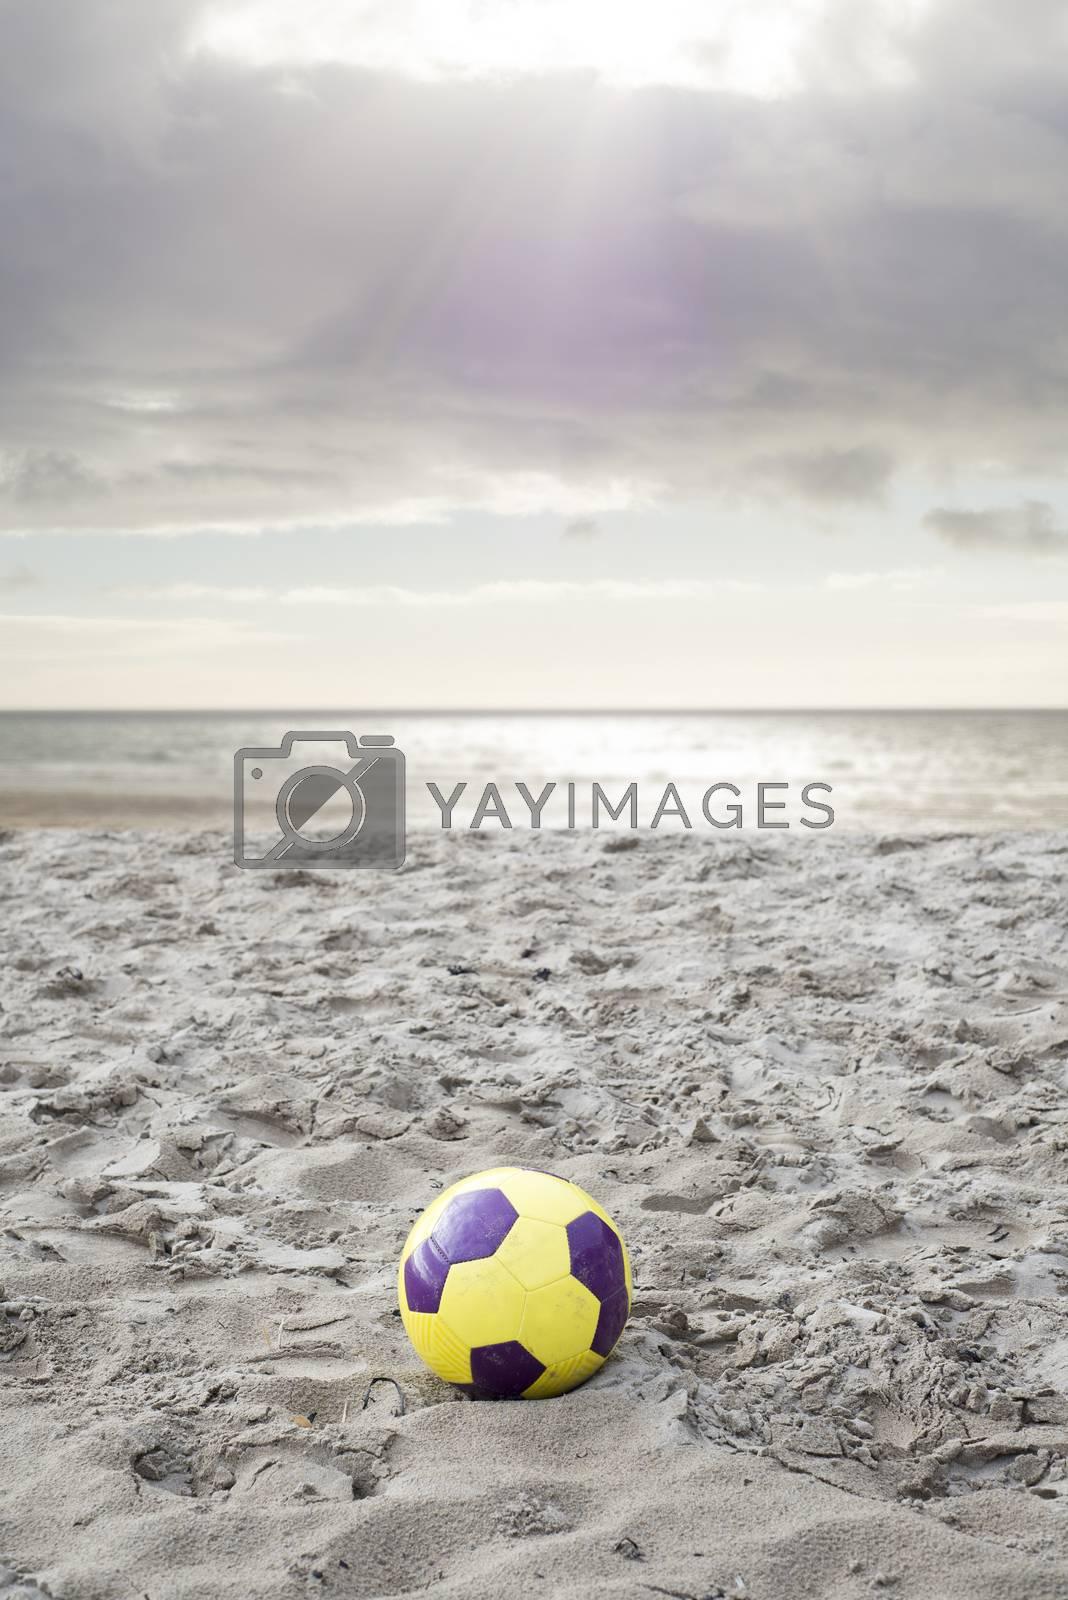 soccer ball on ballybunion beach in county kerry ireland